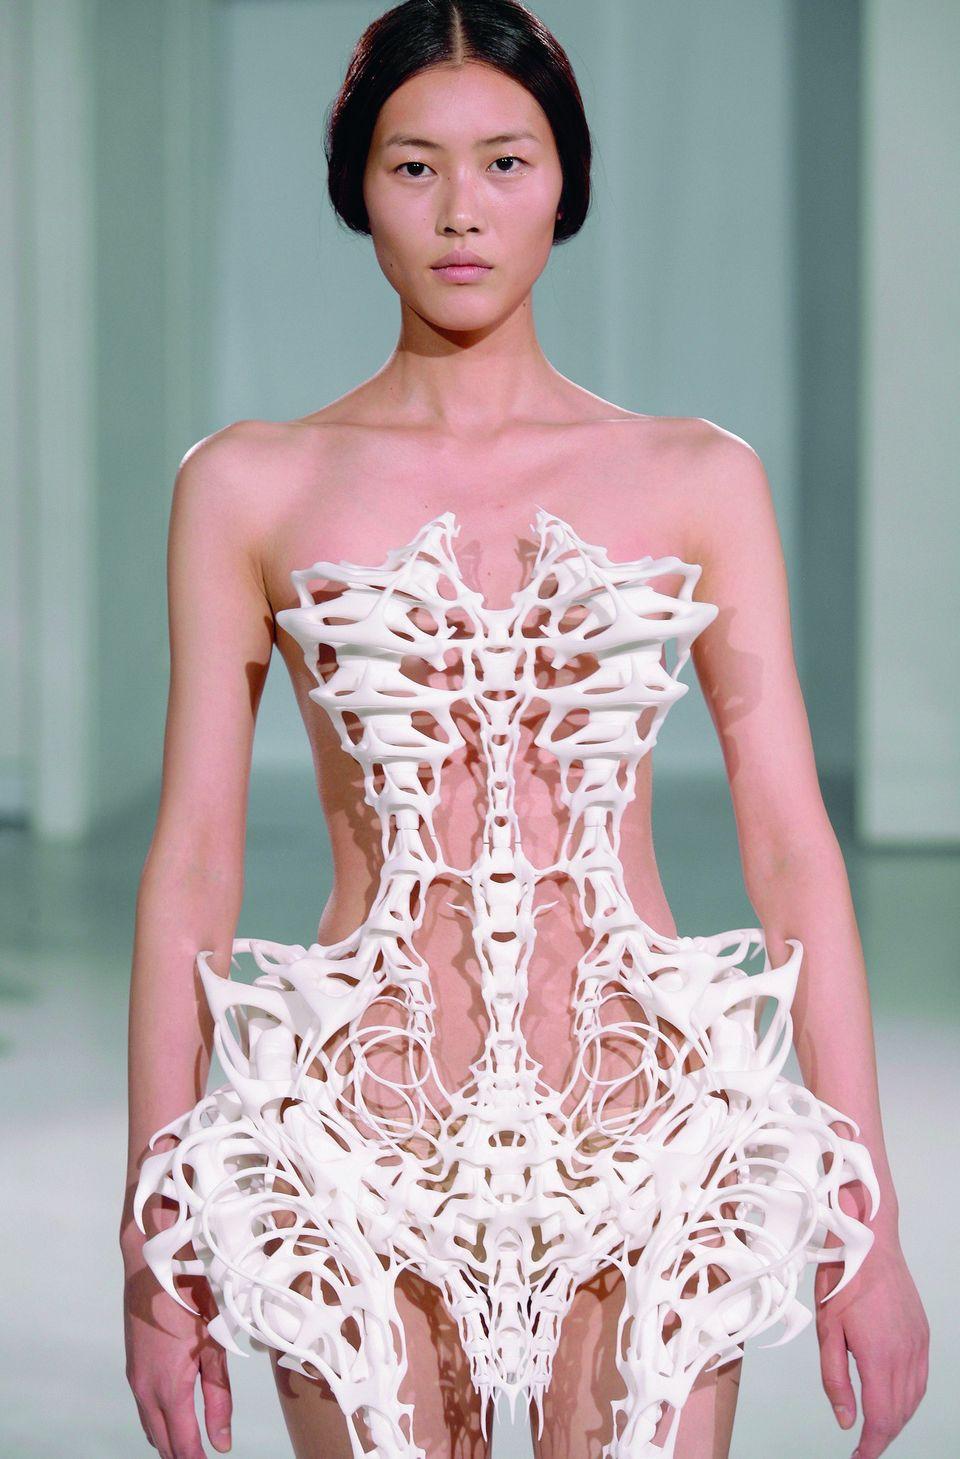 Iris van Herpen Amsterdam, The Netherlands 3-D printed skeleton dress Curator: A. F. Vanderborst   Pattern, 100 Fashion Desig